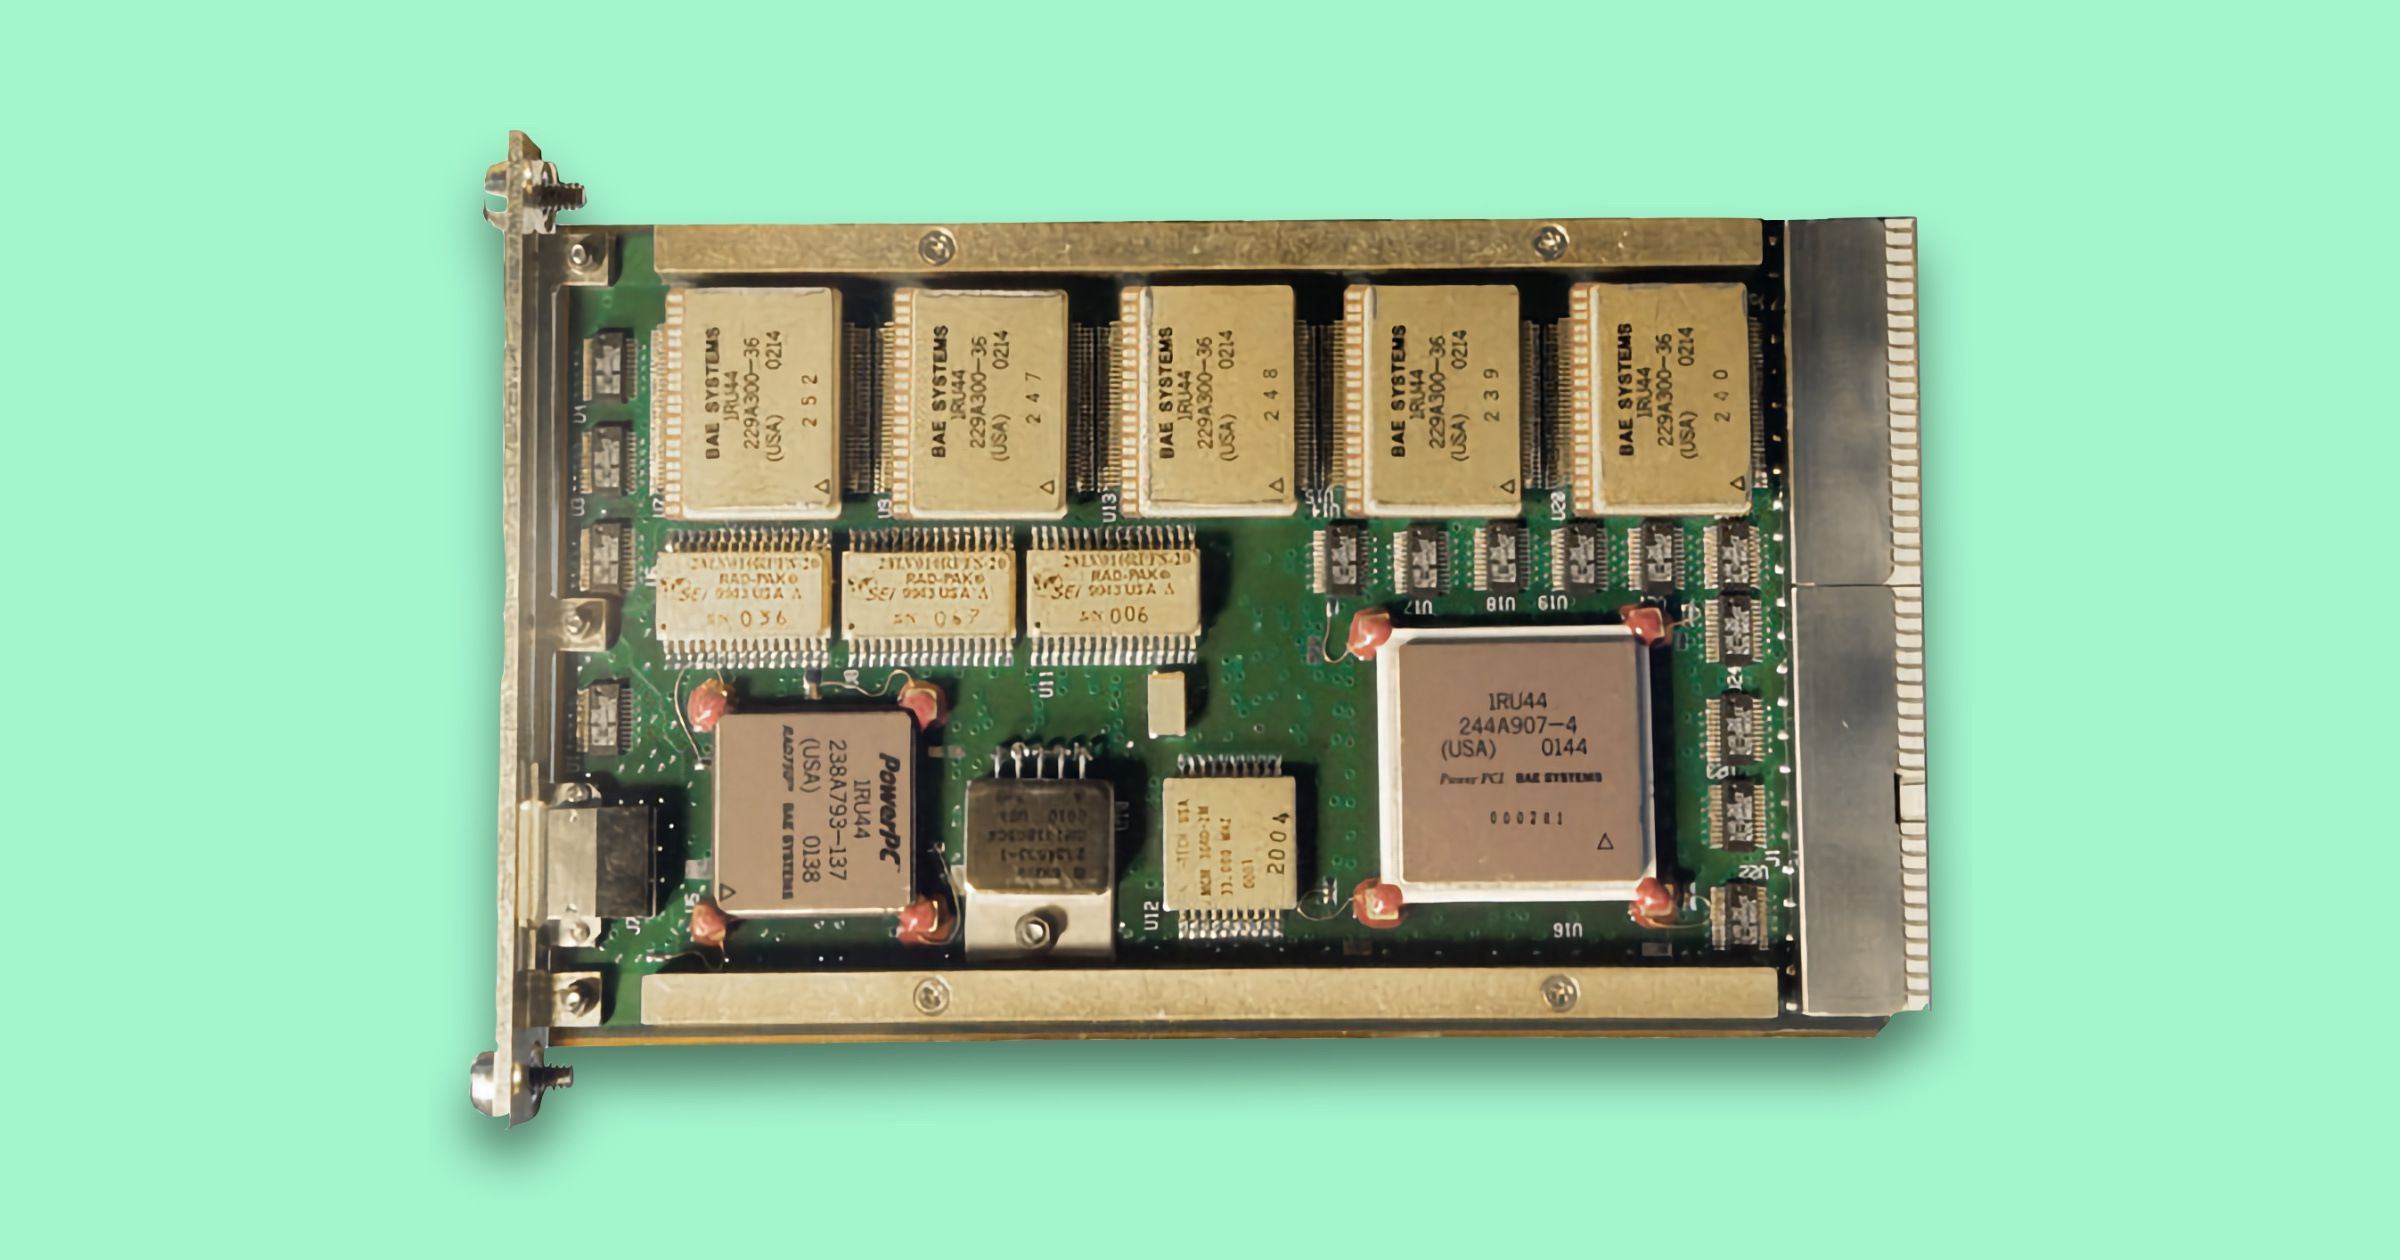 RAD750 processor